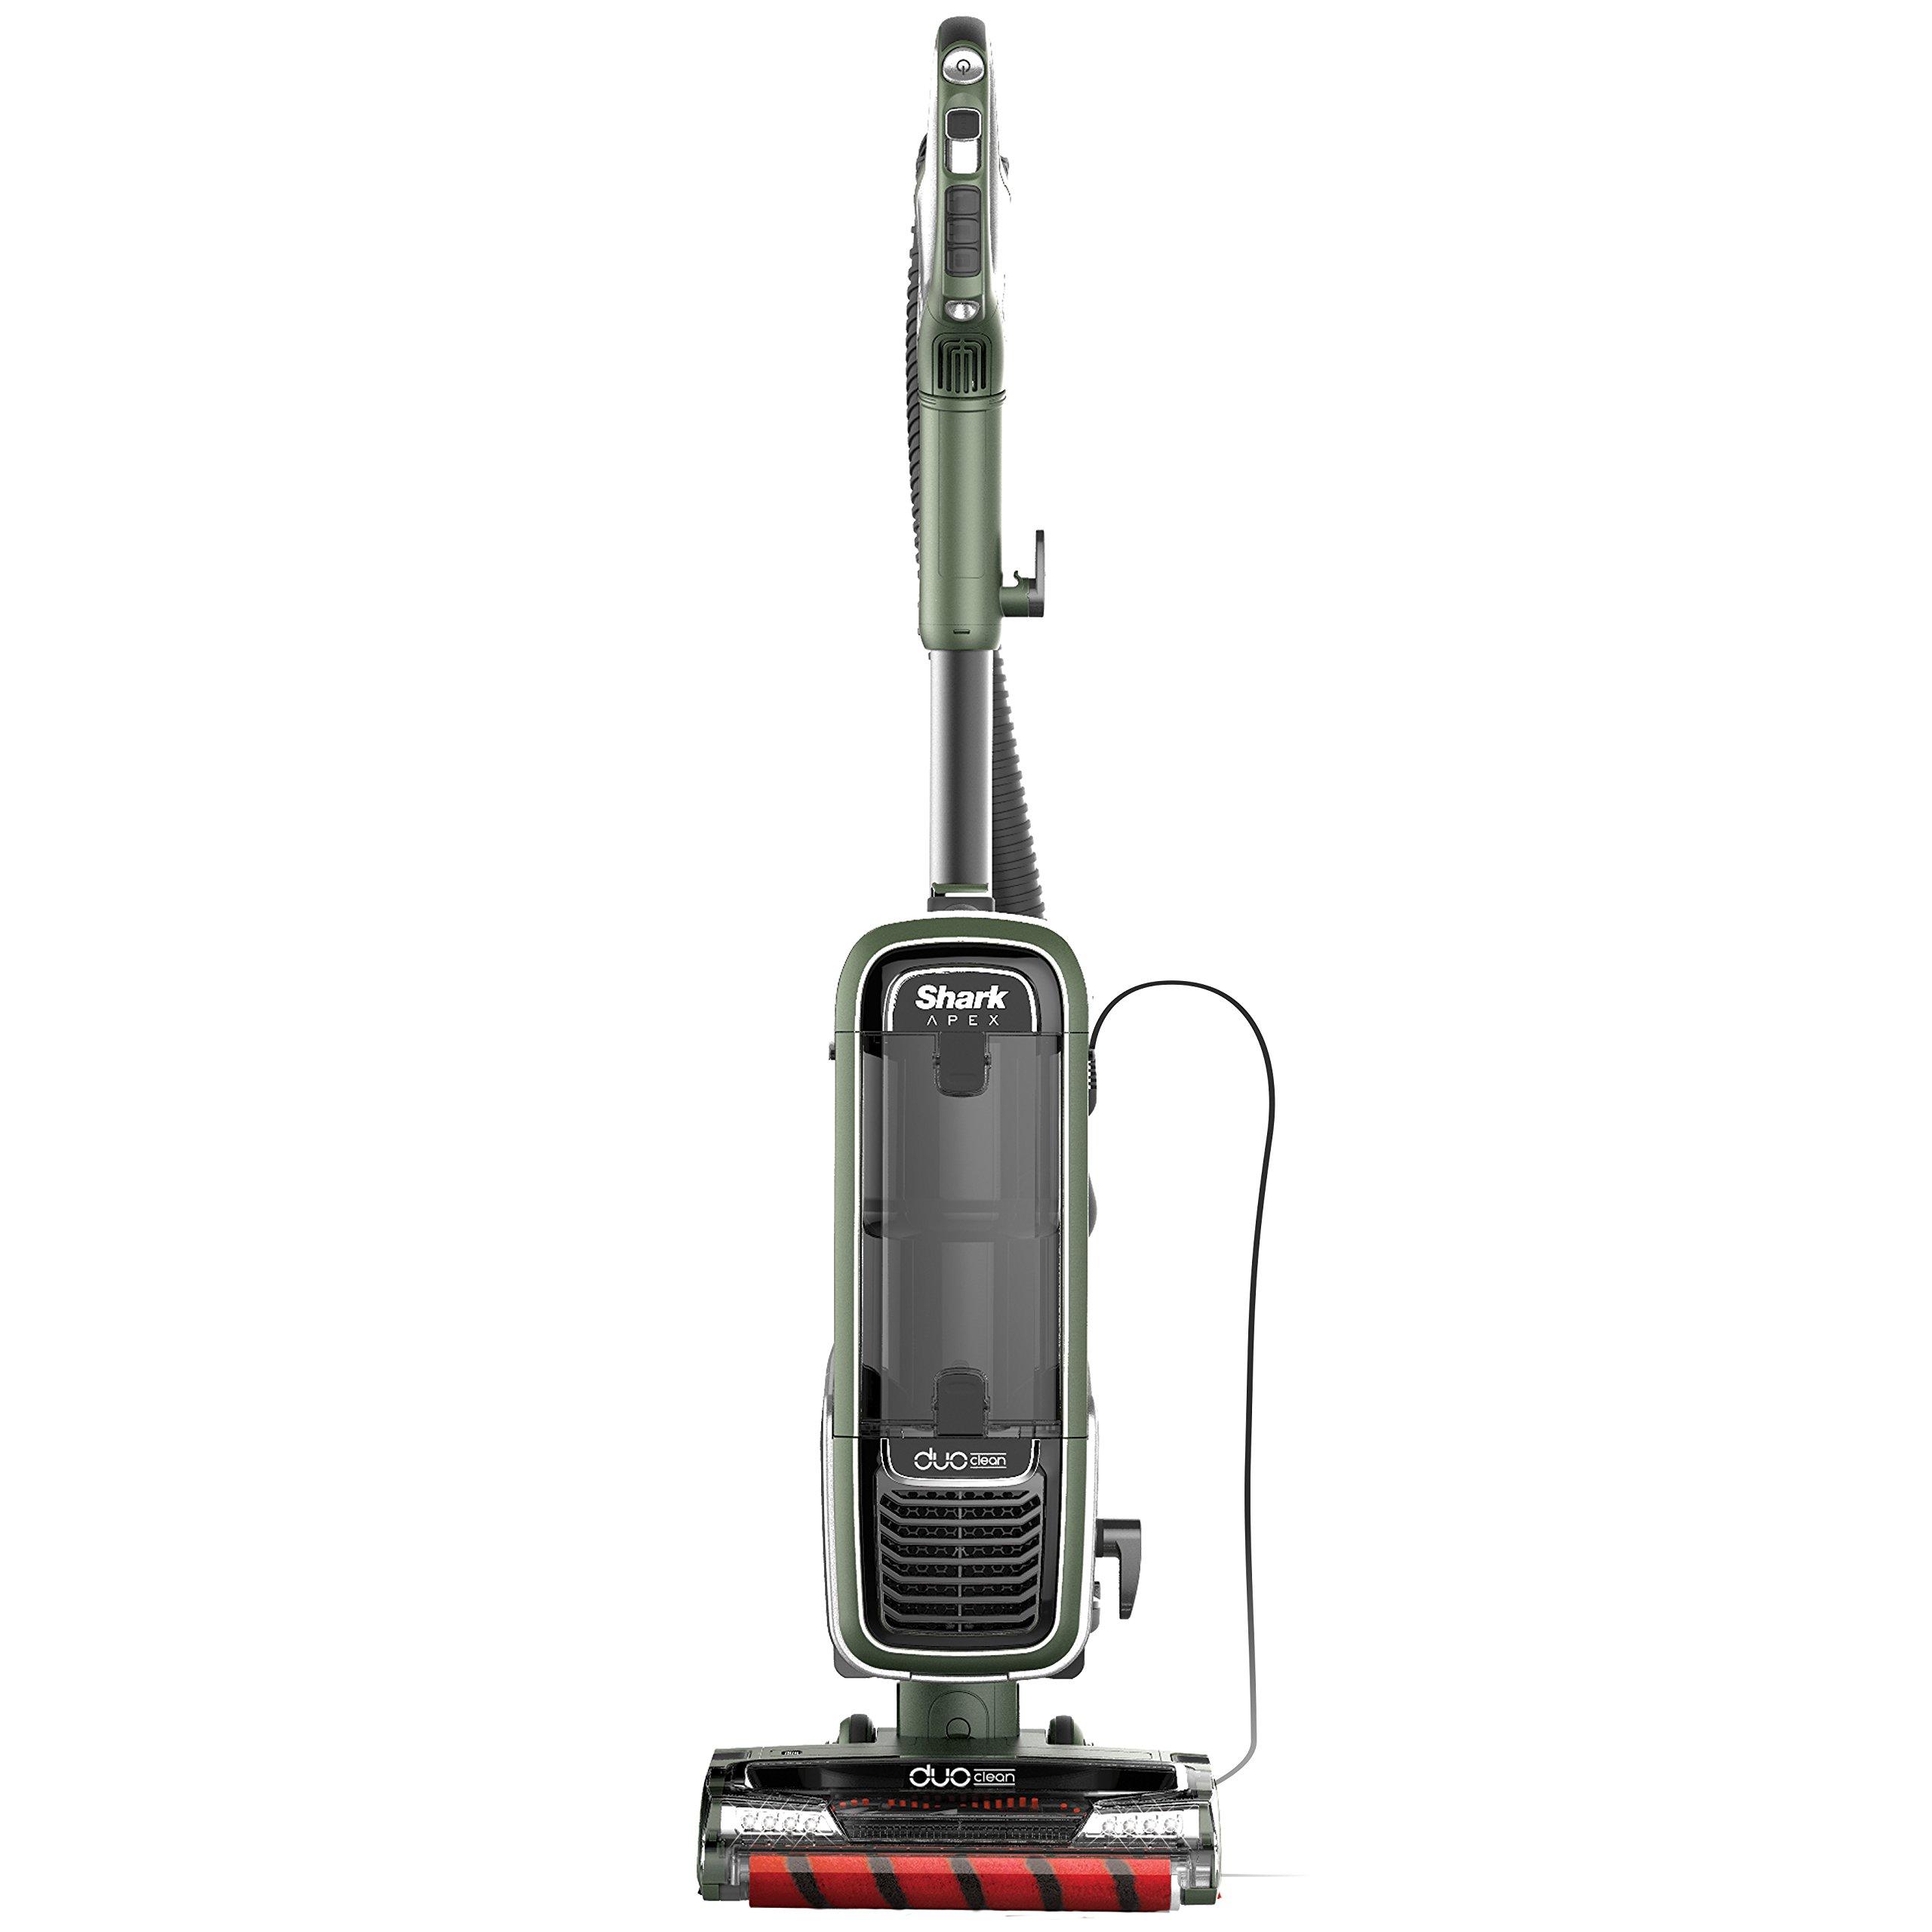 Shark APEX DuoClean Powered Lift-Away Upright Vacuum (AX951)